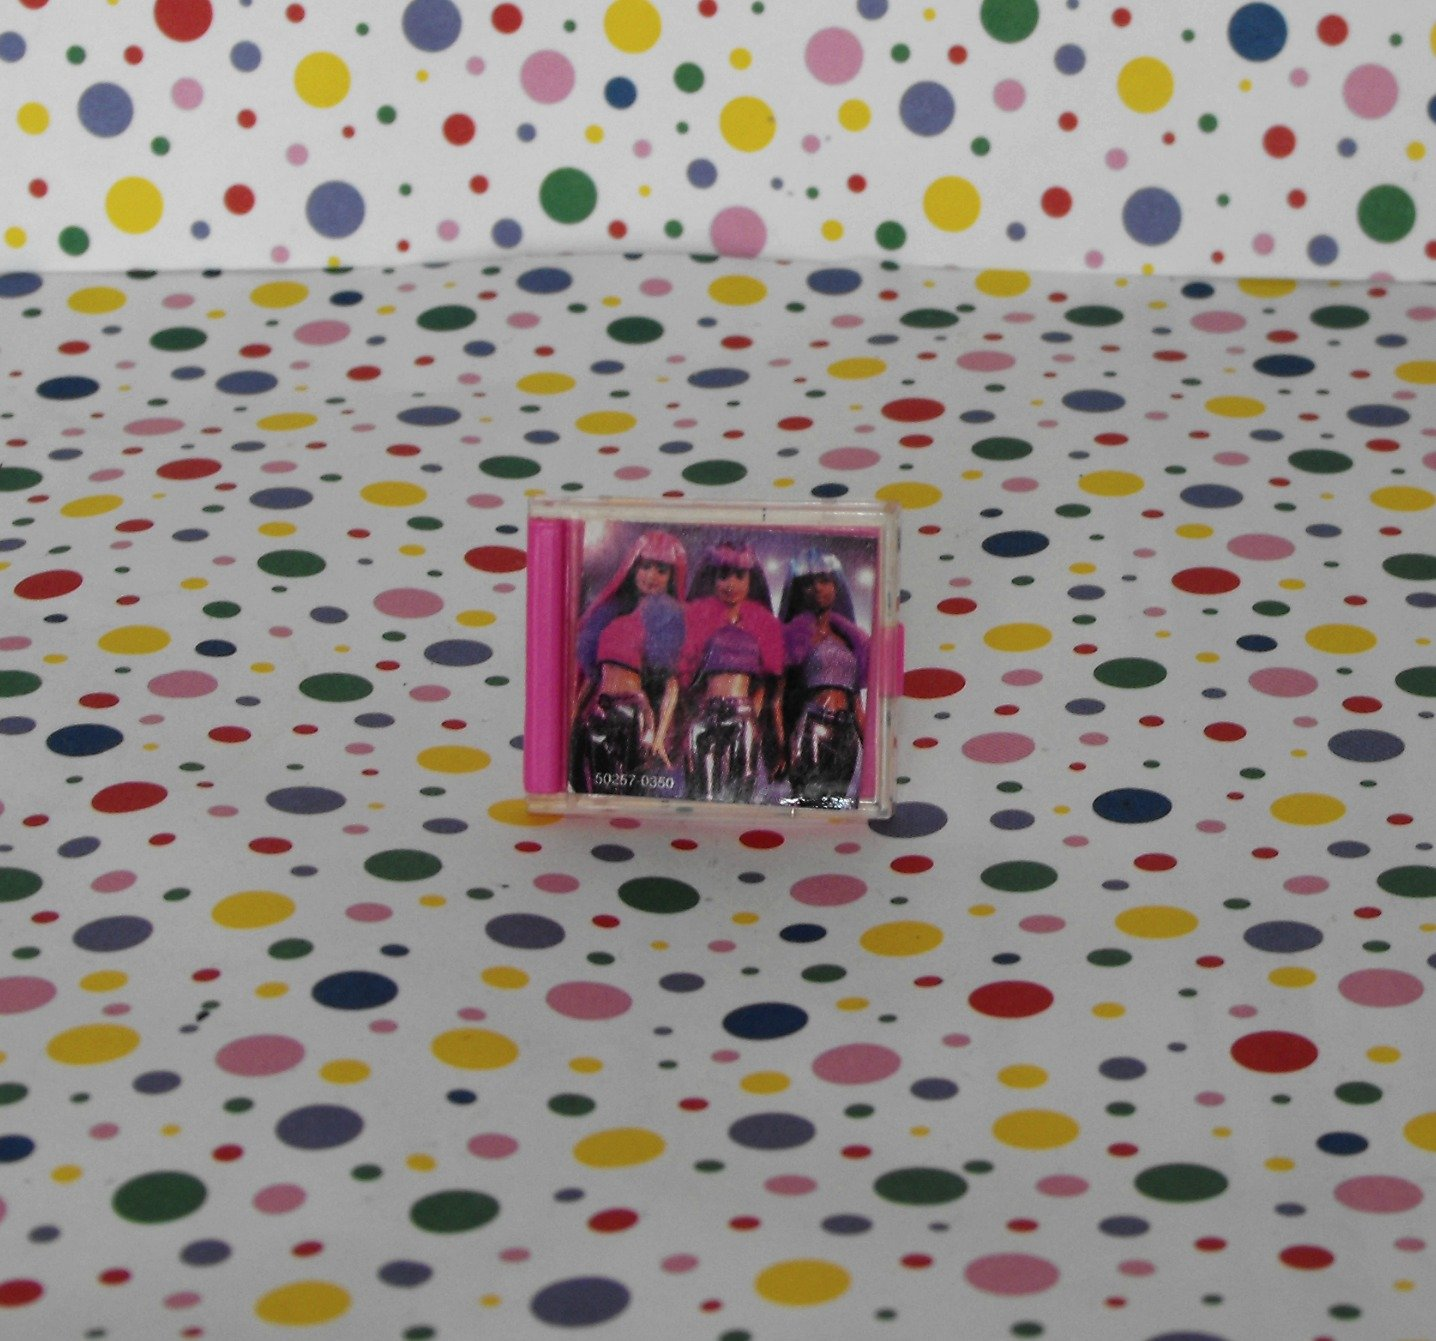 Barbie Jam �N Glam Barbie CD Jewel Case